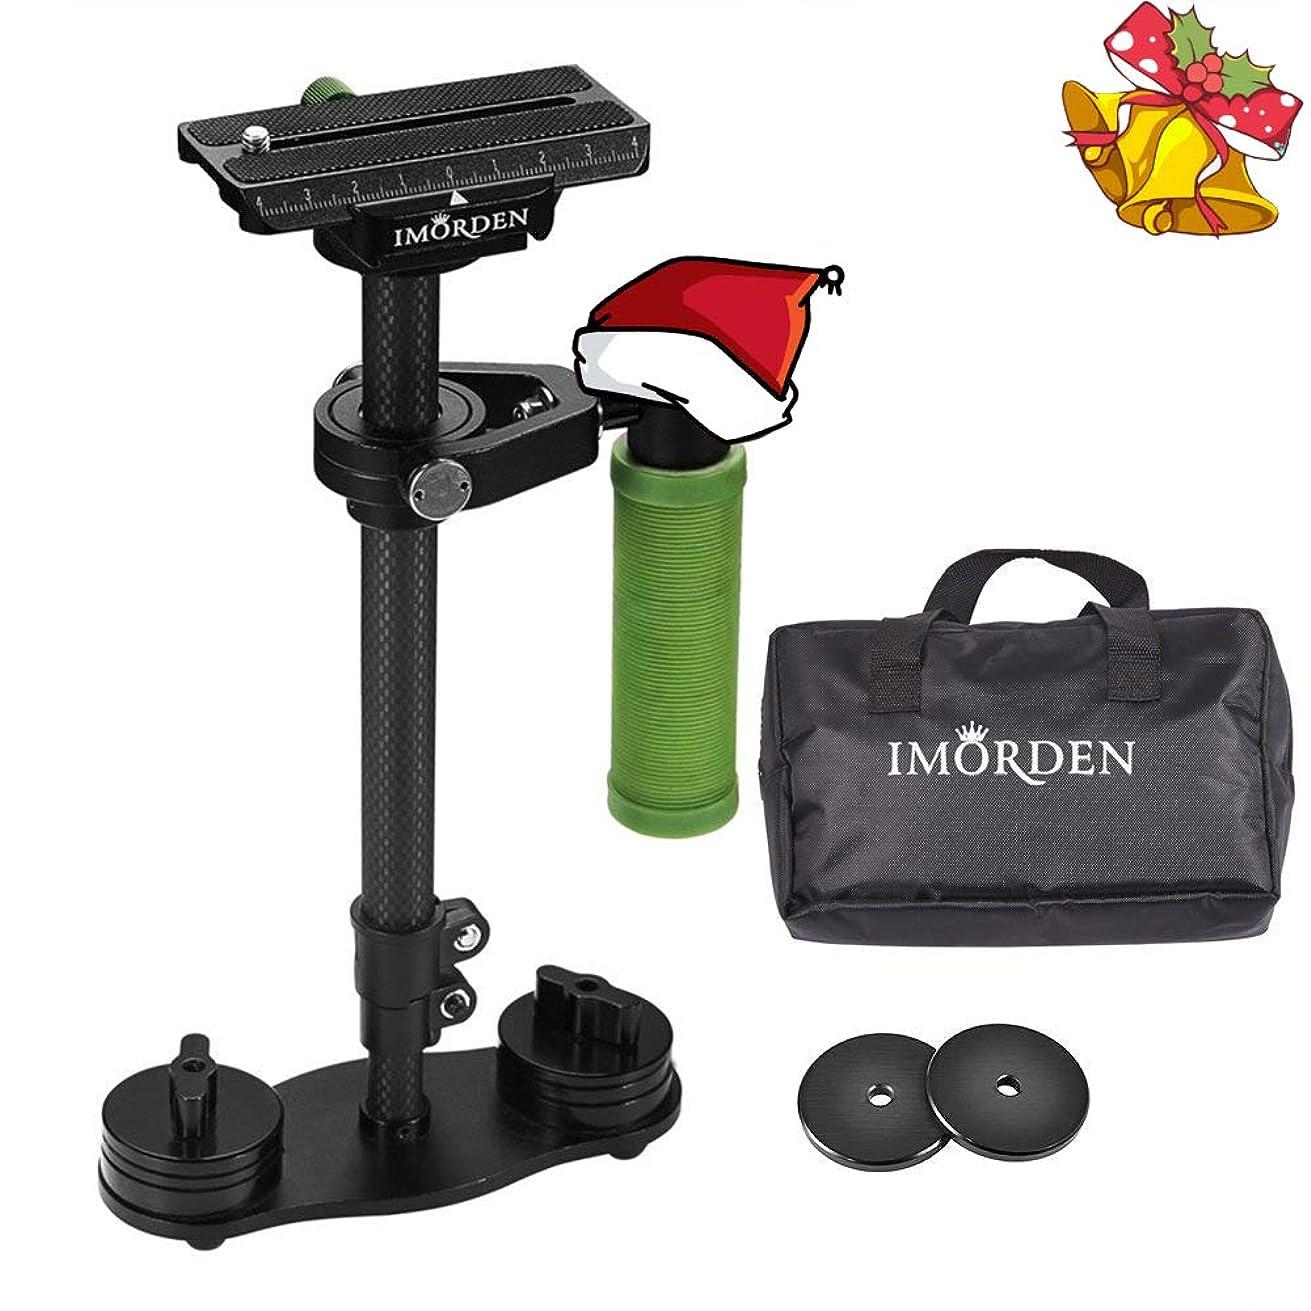 IMORDEN Carbon Fiber S-40c Video Handheld Camera Stabilizer Movie Kit Film Making System for Gopro, Smartphone, iPhone, Canon, Sony, Nikon, Pentax, Panasonic DSLR Camera(0.5~2.3lbs)